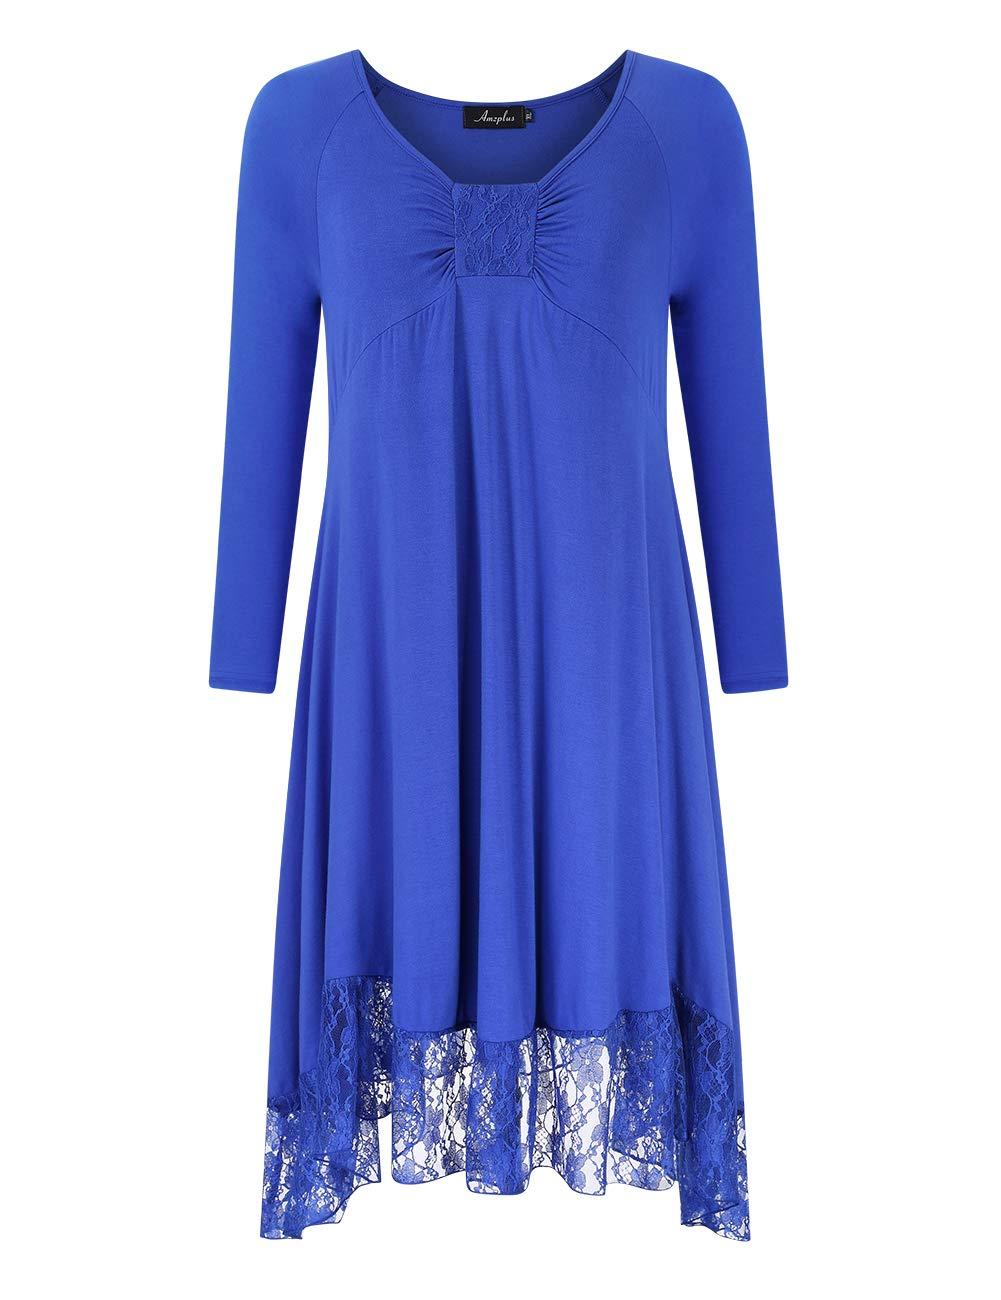 AMZ PLUS Women's Plus Size Lace Stitching Long Sleeve Casual Maxi Swing Dress Blue XL